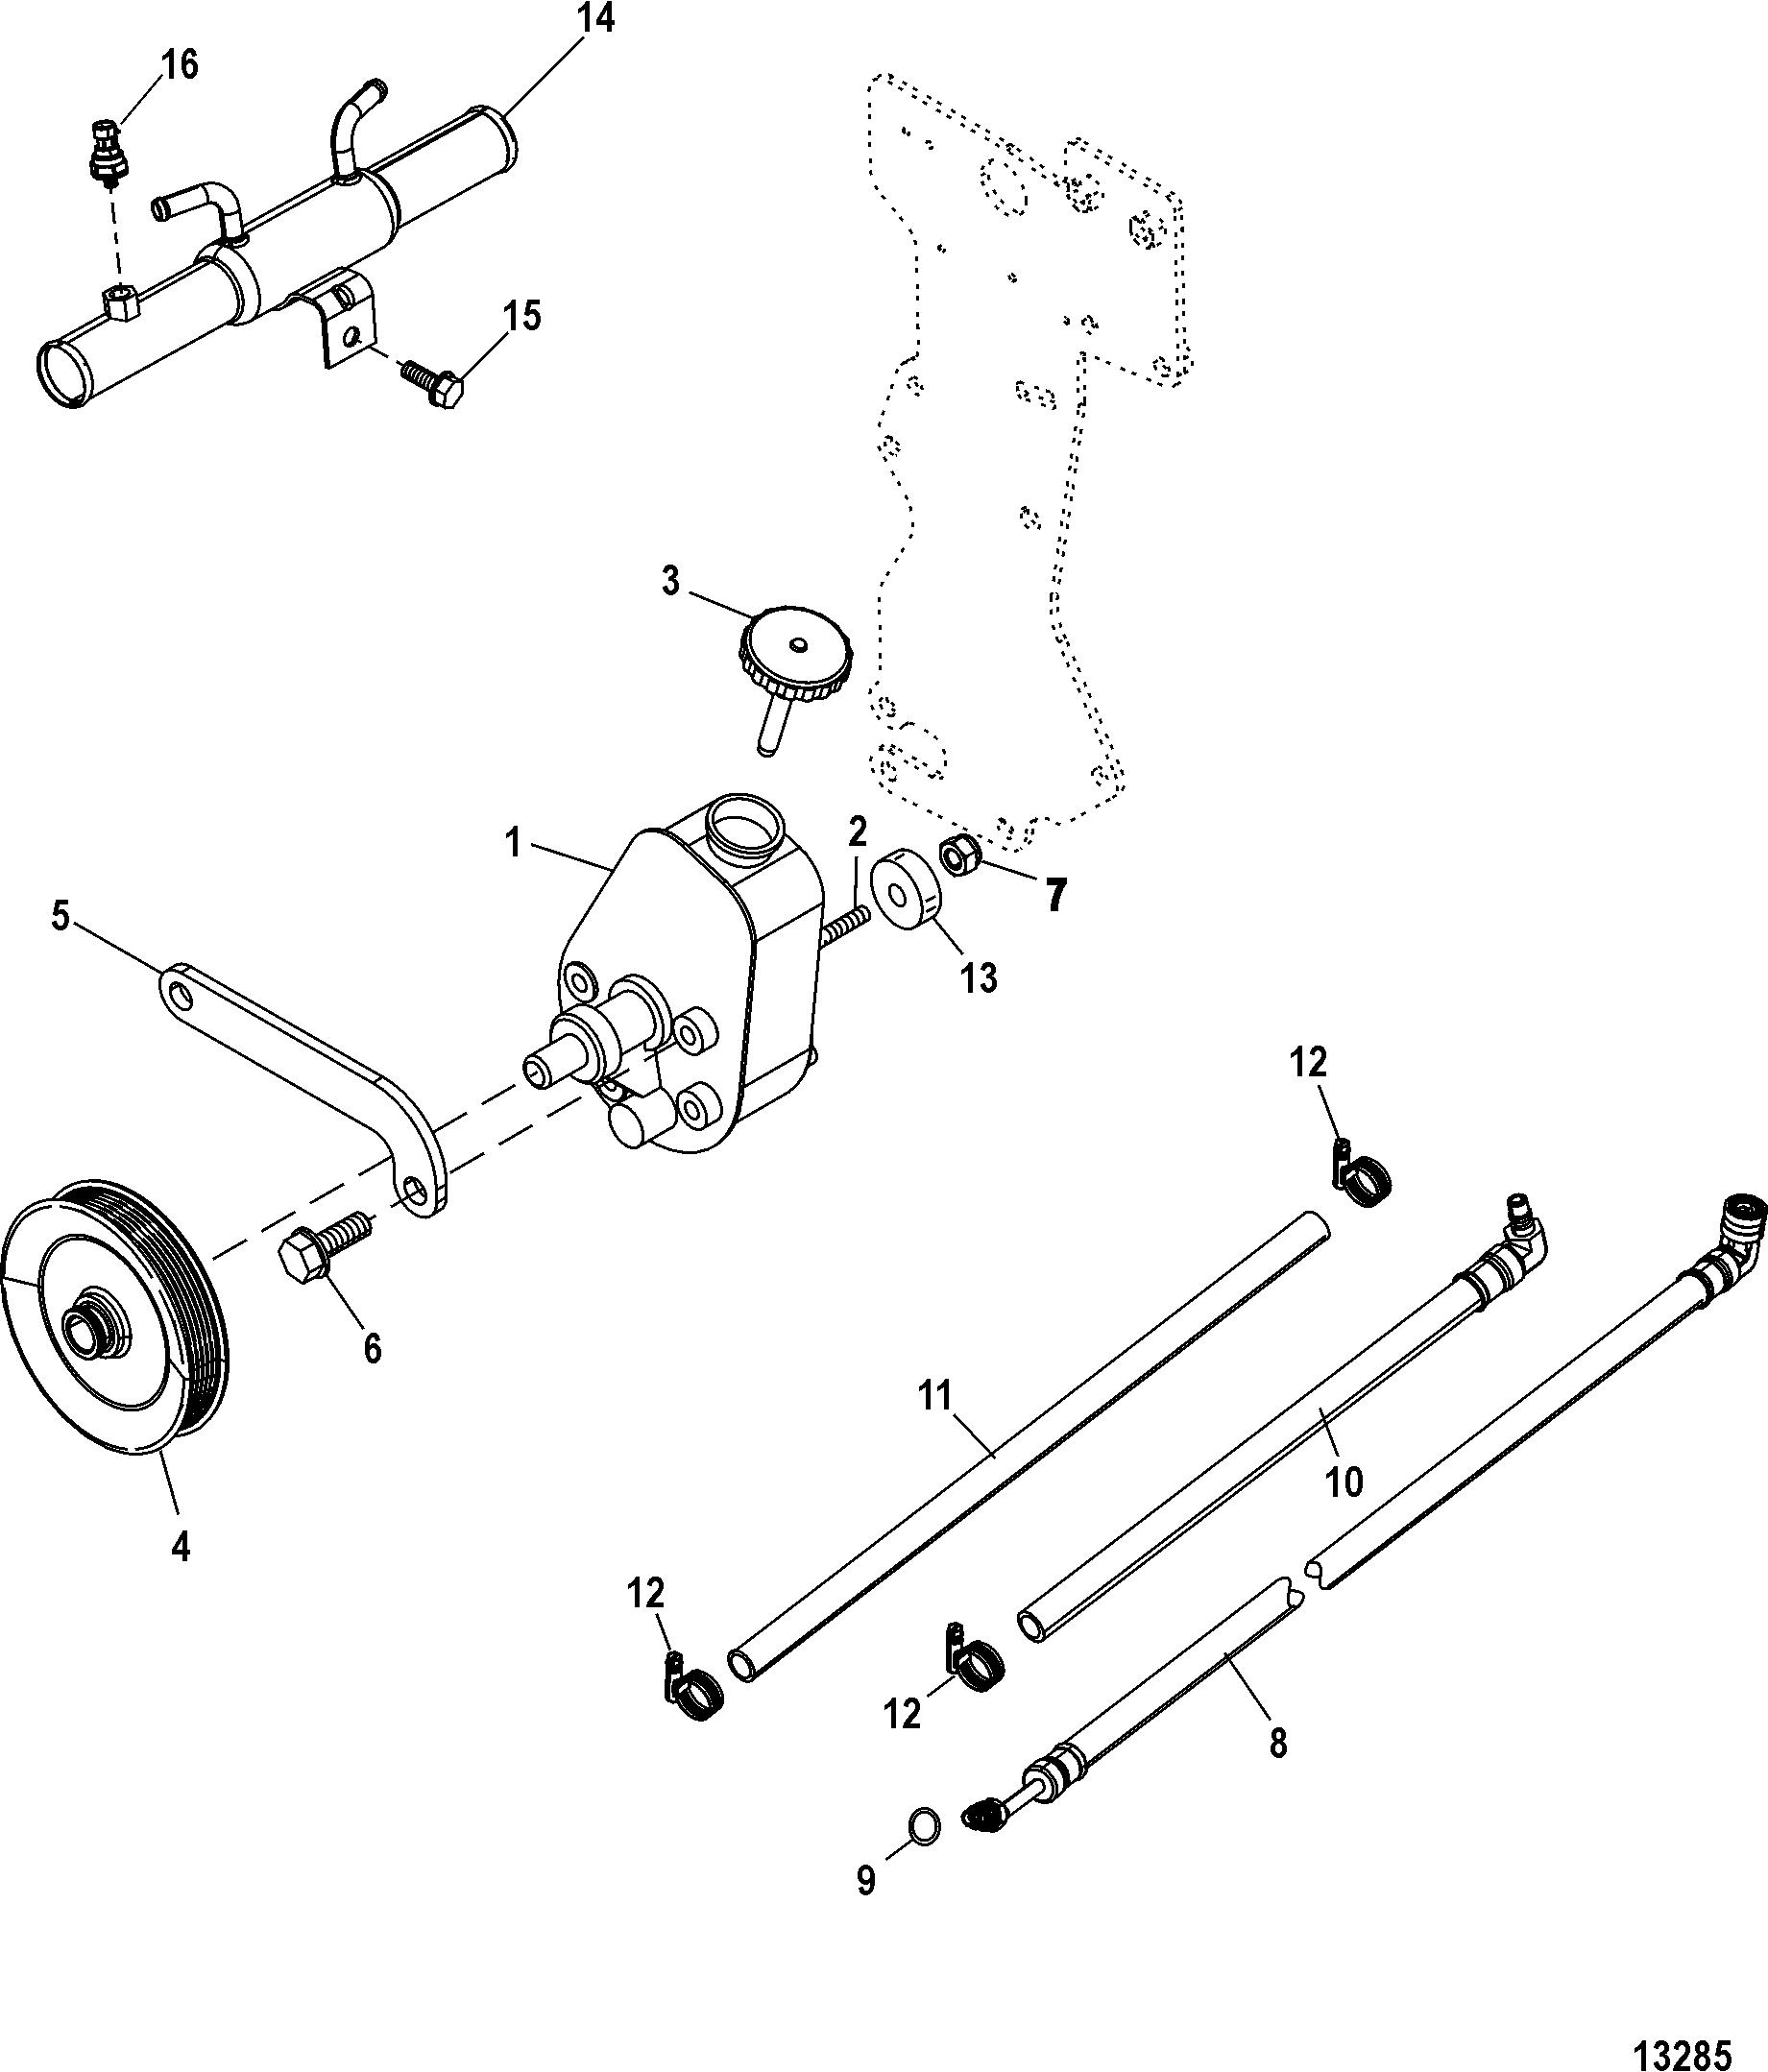 mercury mercruiser 4.3 service manual